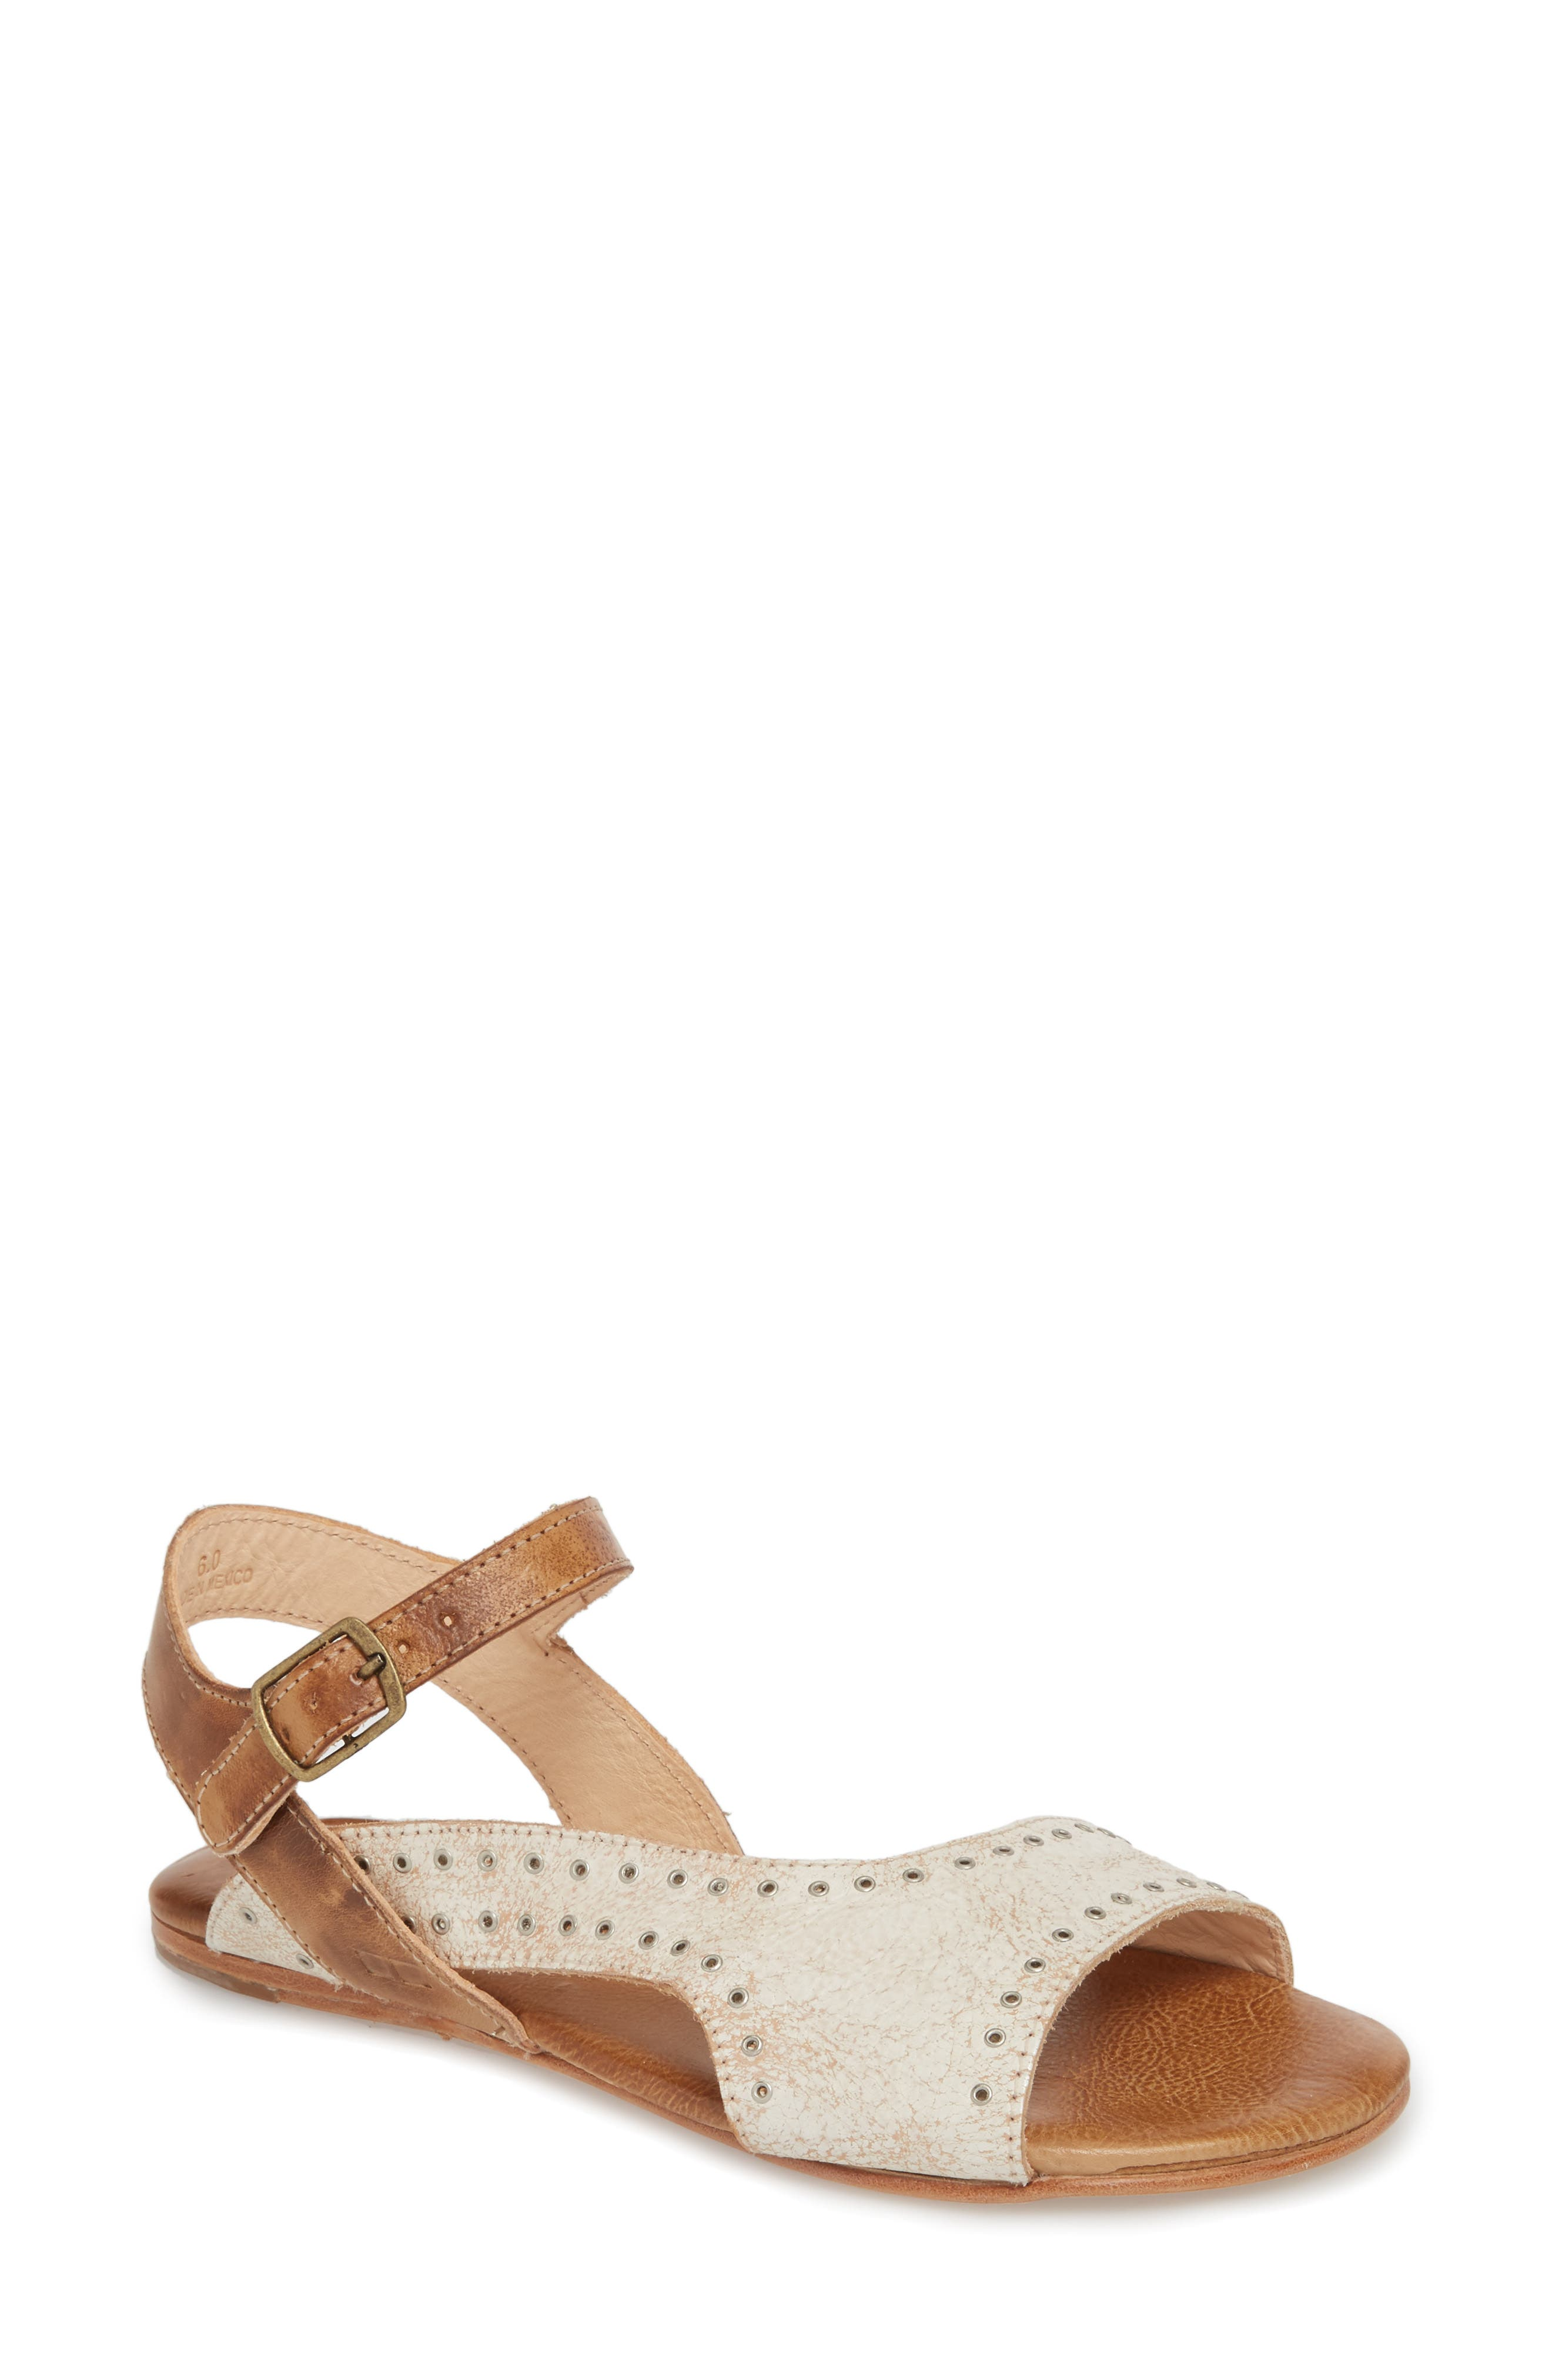 Auburn Flat Sandal,                             Main thumbnail 1, color,                             Nectar/ Tan Leather